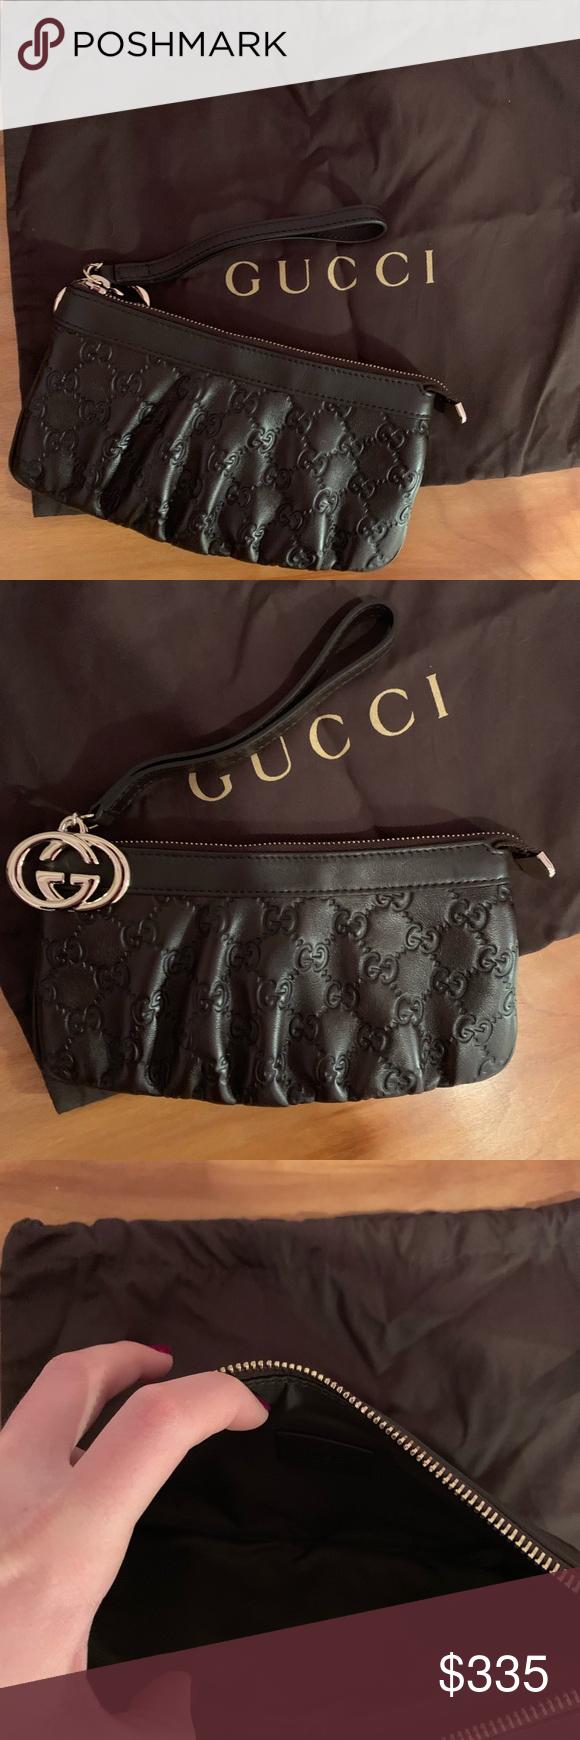 13febd4c78c Gucci leather wristlet Gucci GG Guccissima leather wristlet - brown with  Gucci pochette bag- interlocking G s Designer id  212203 Never been worn ...